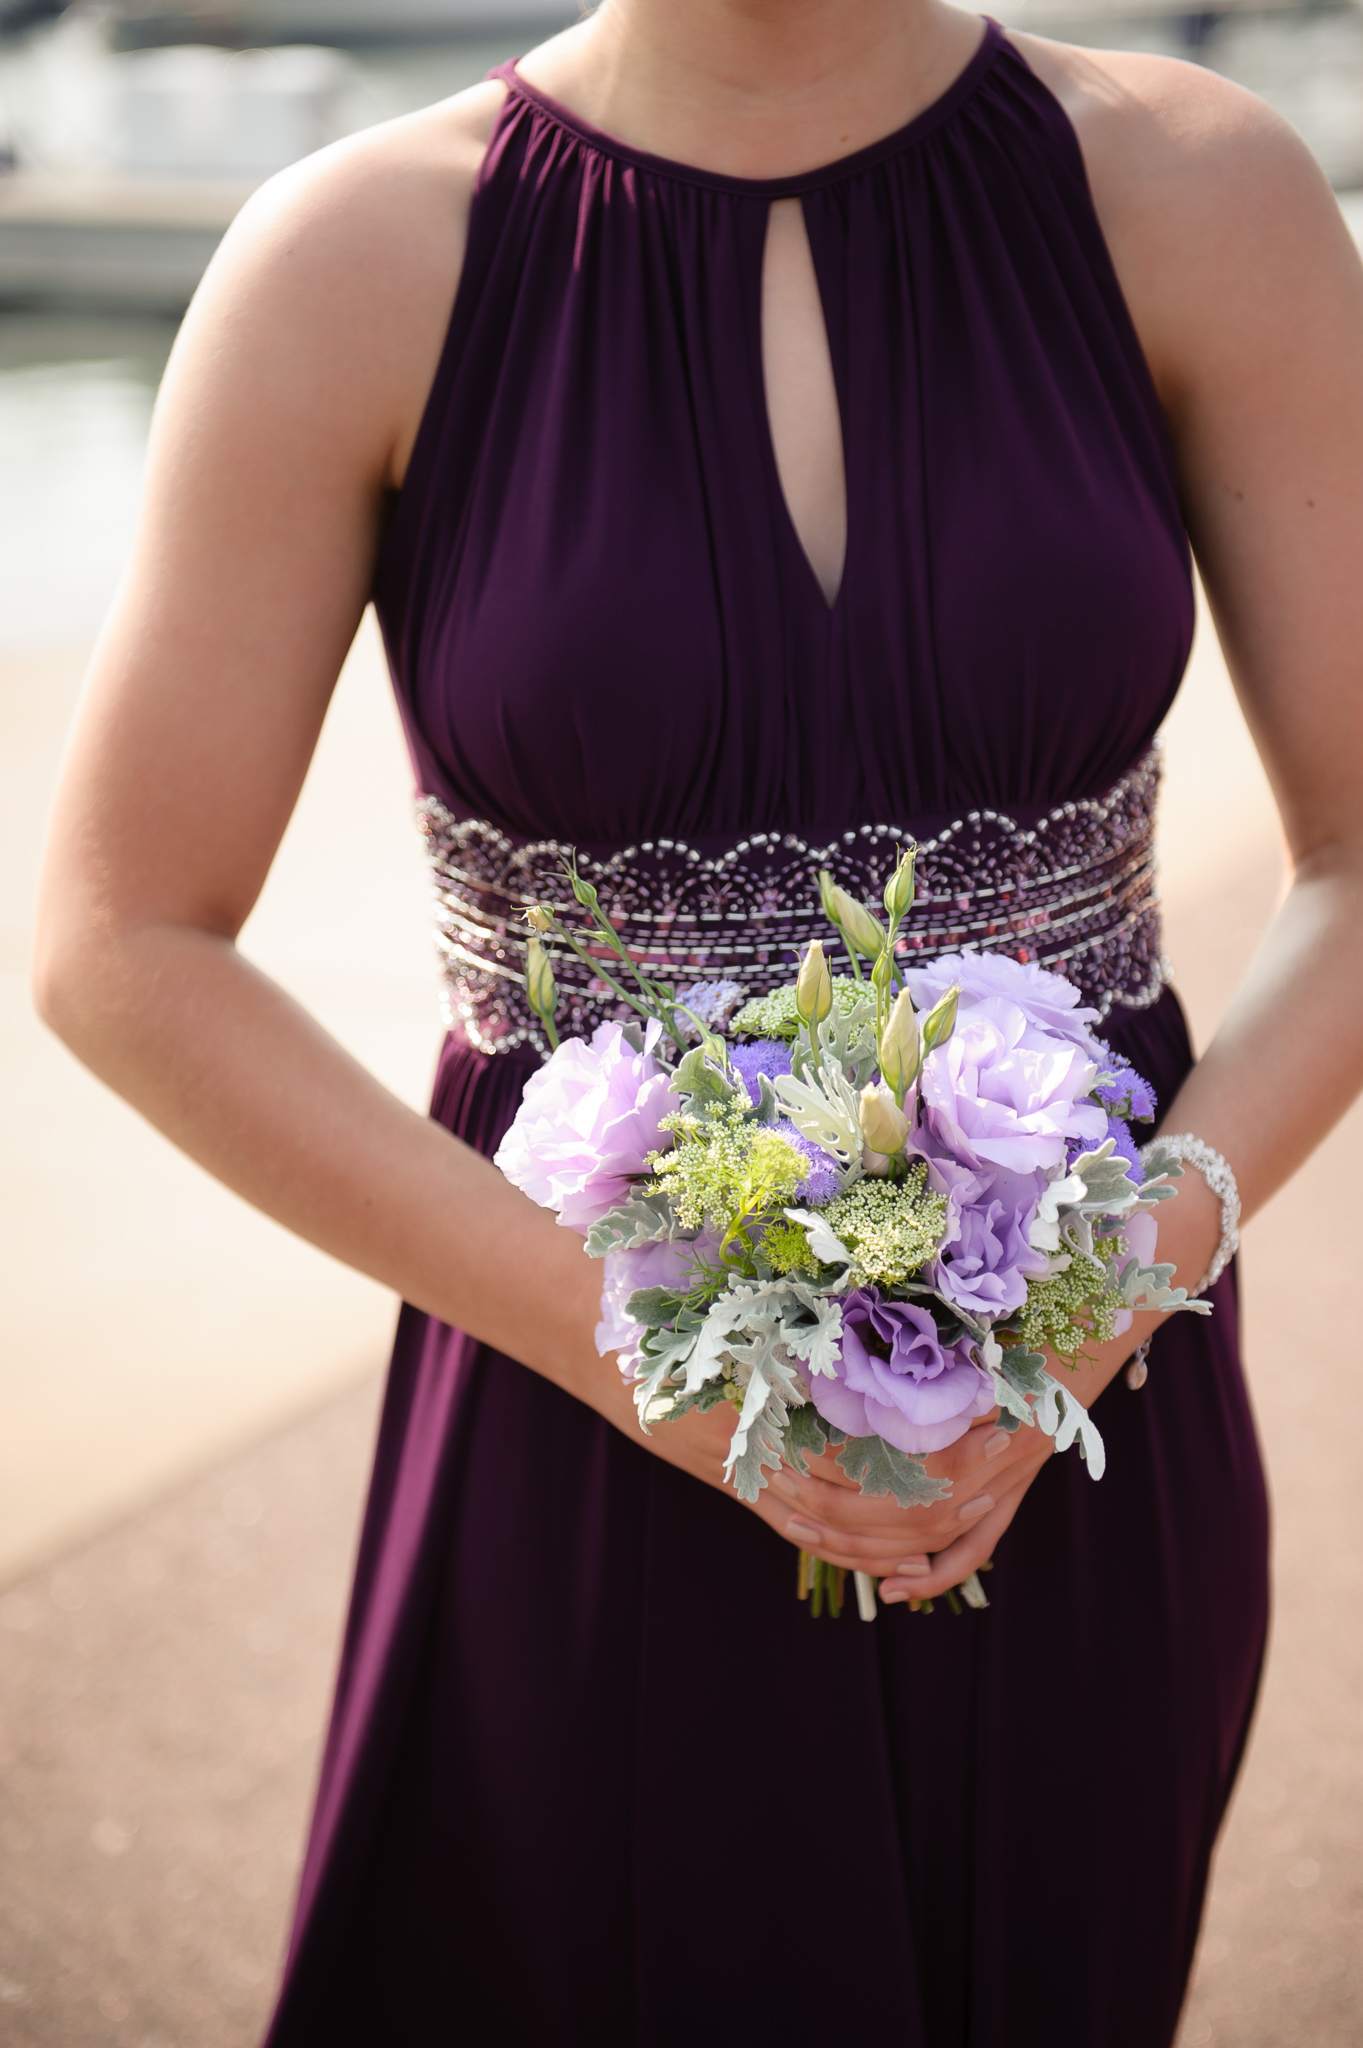 33-ashland washburn wedding photography700_5368.jpg